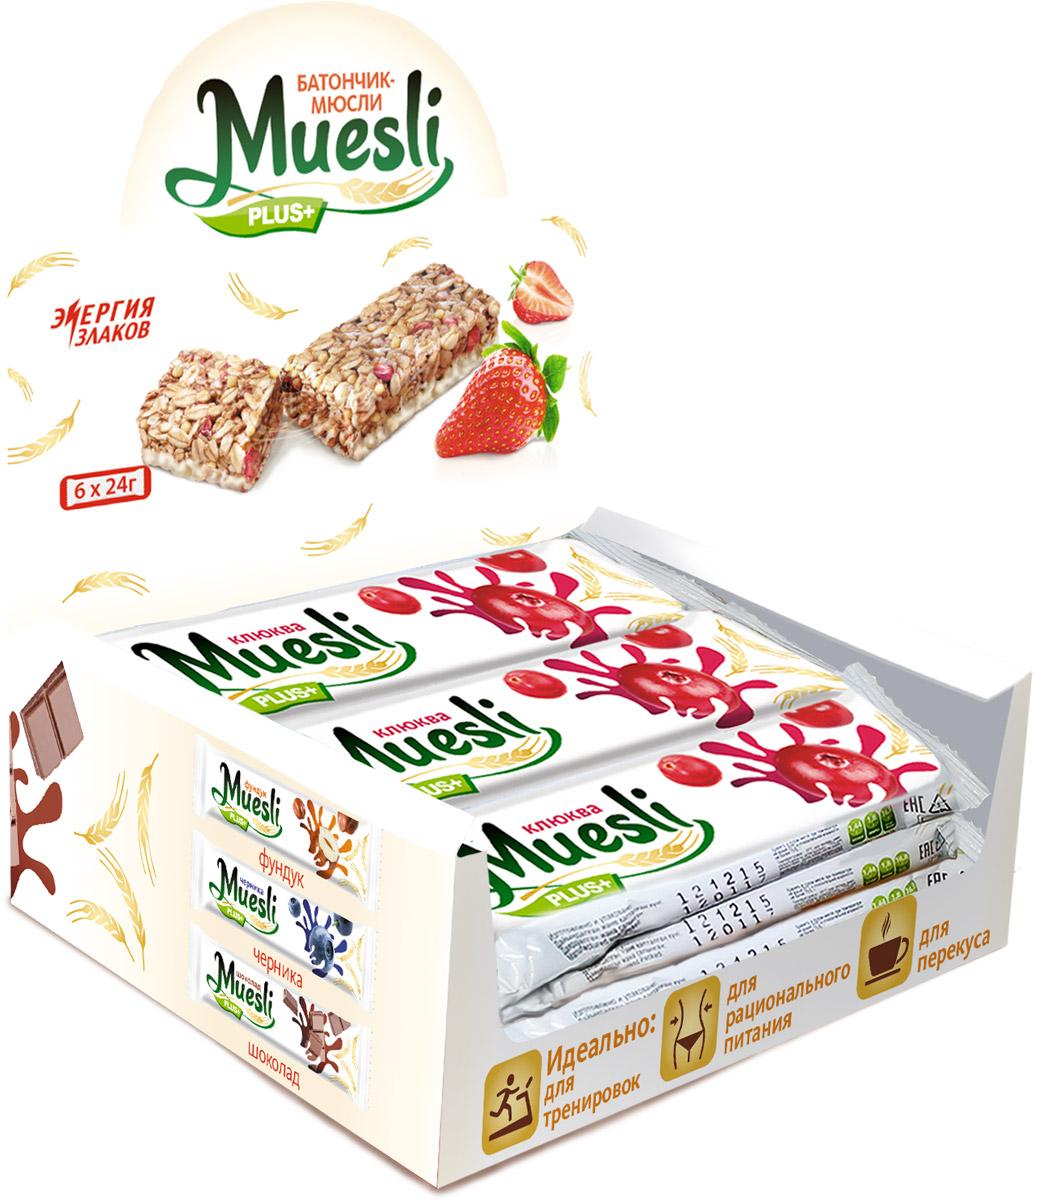 Matti Muesli Plus батончик мюсли клюква, 6 шт по 24 г легко батончик мюсли банан 27 г